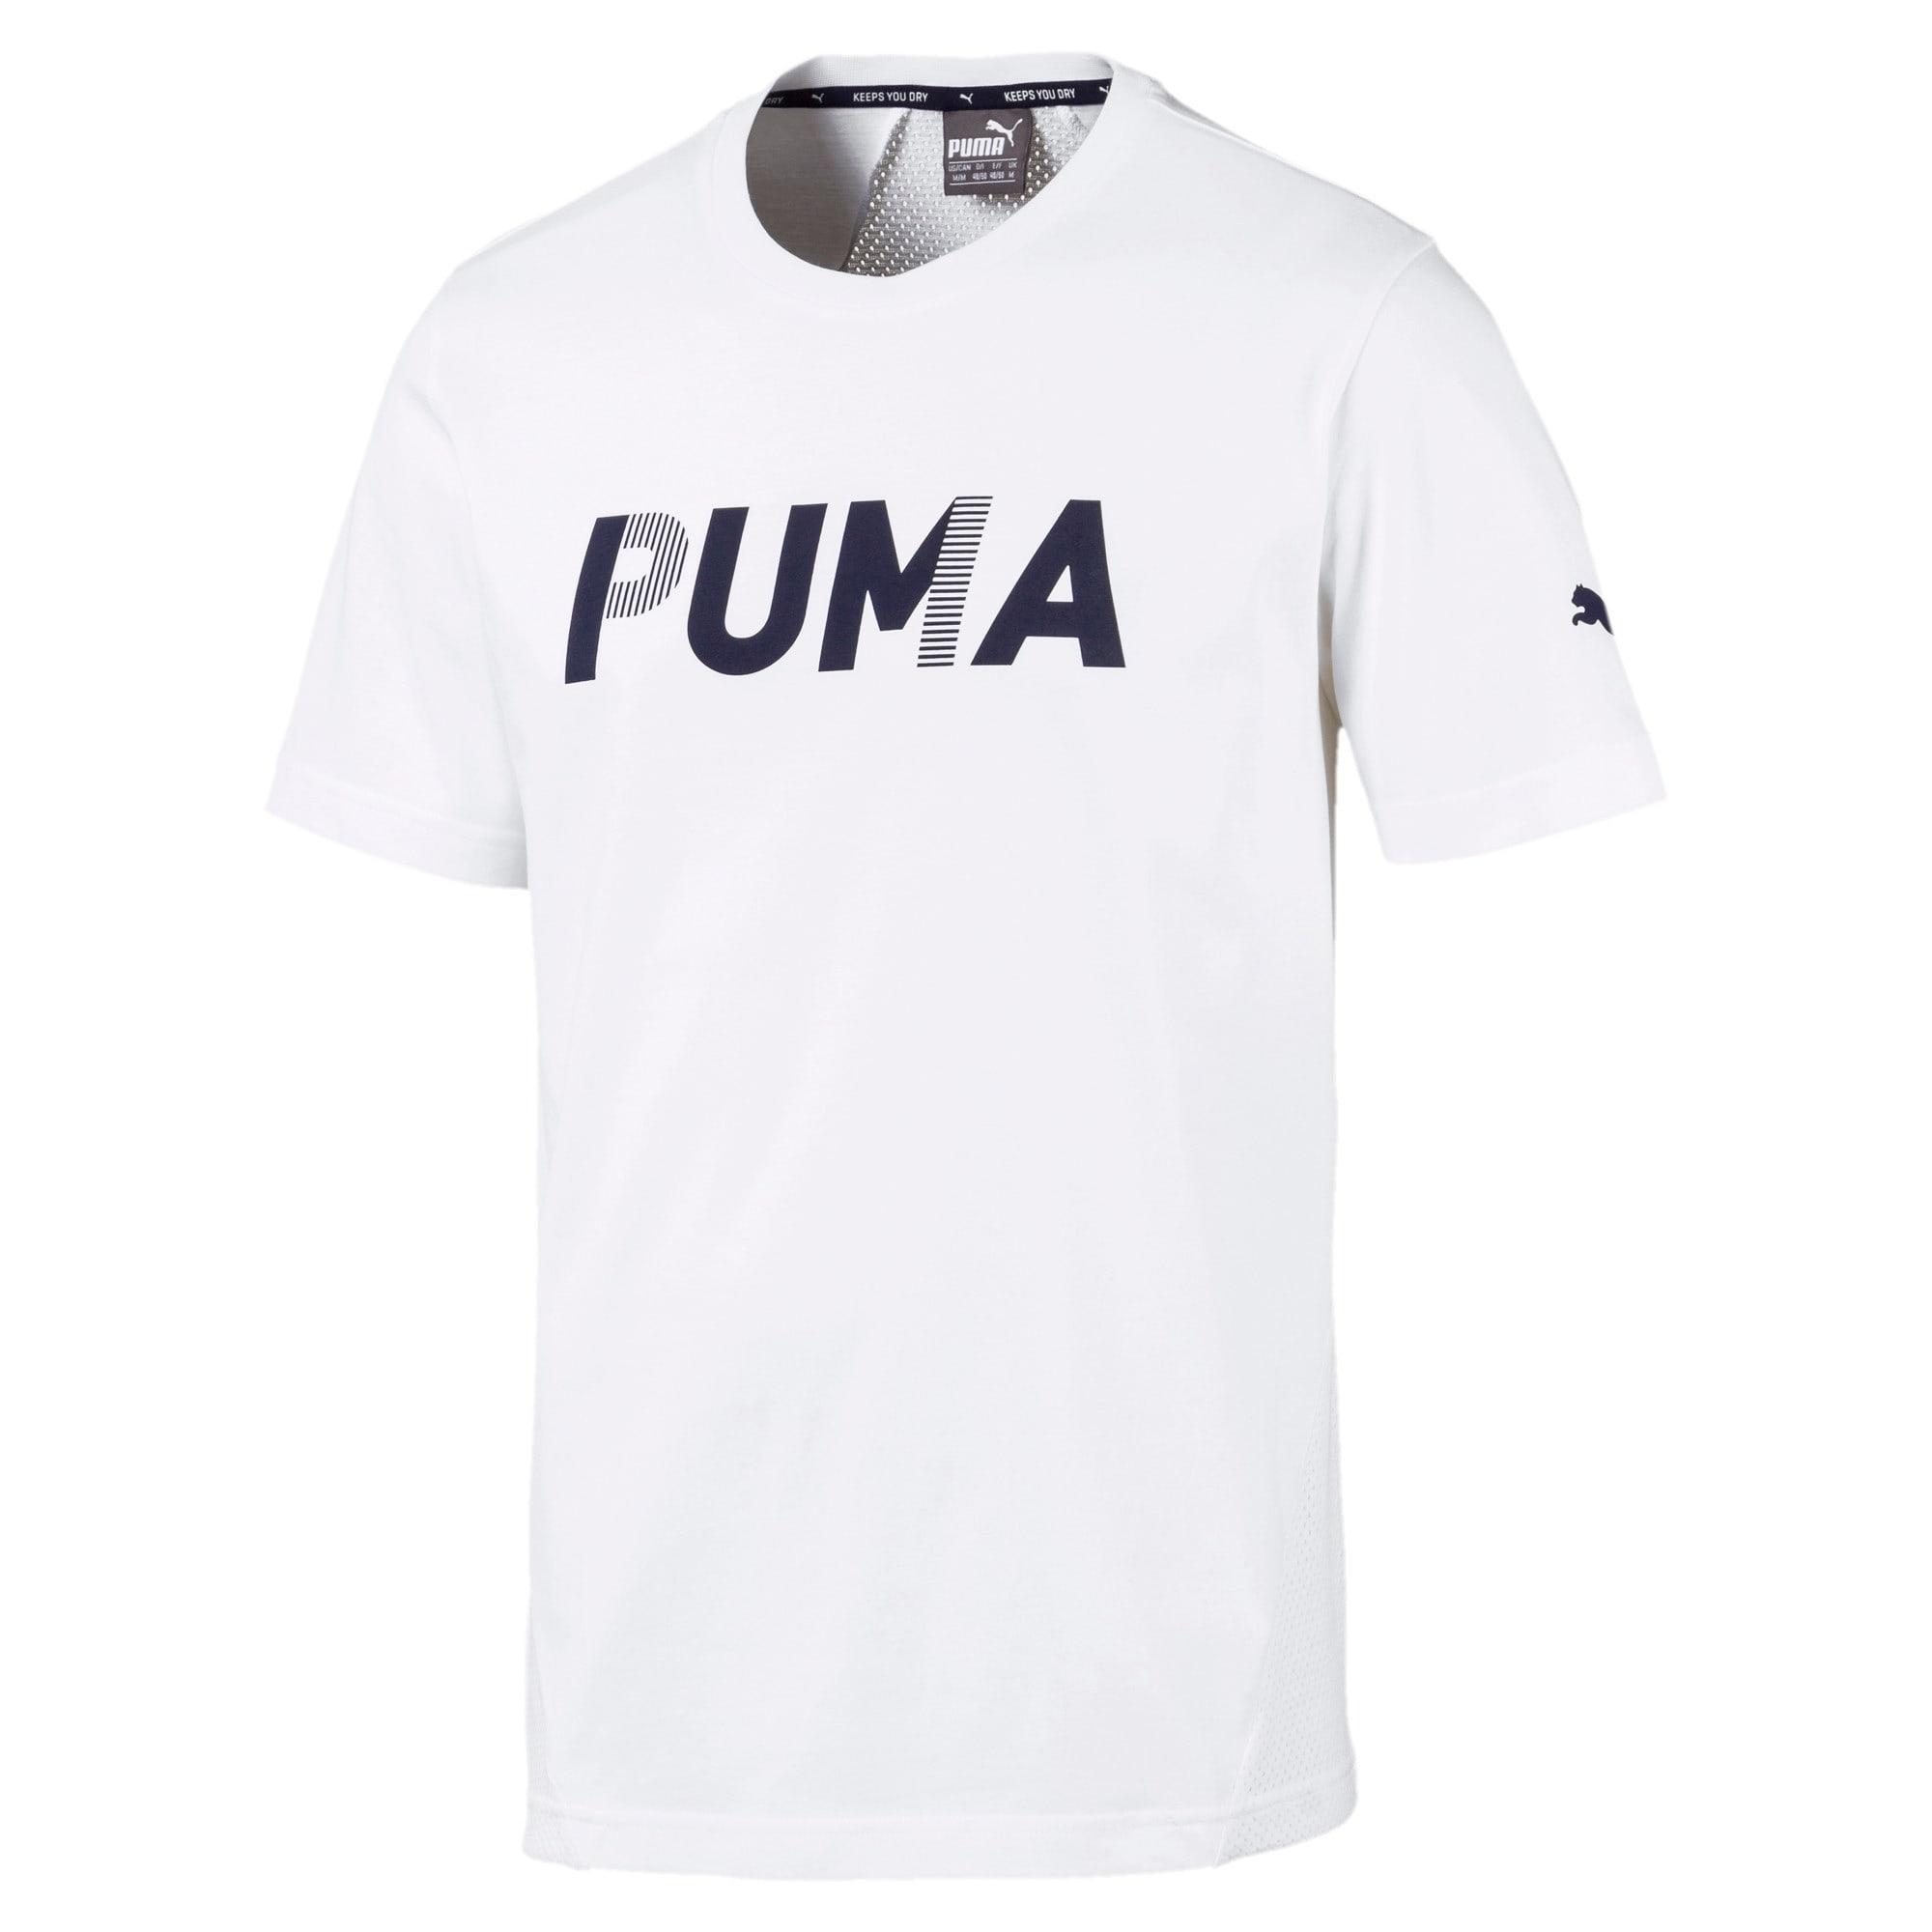 Thumbnail 4 of Modern Sports Advanced Men's Tee, Puma White, medium-IND